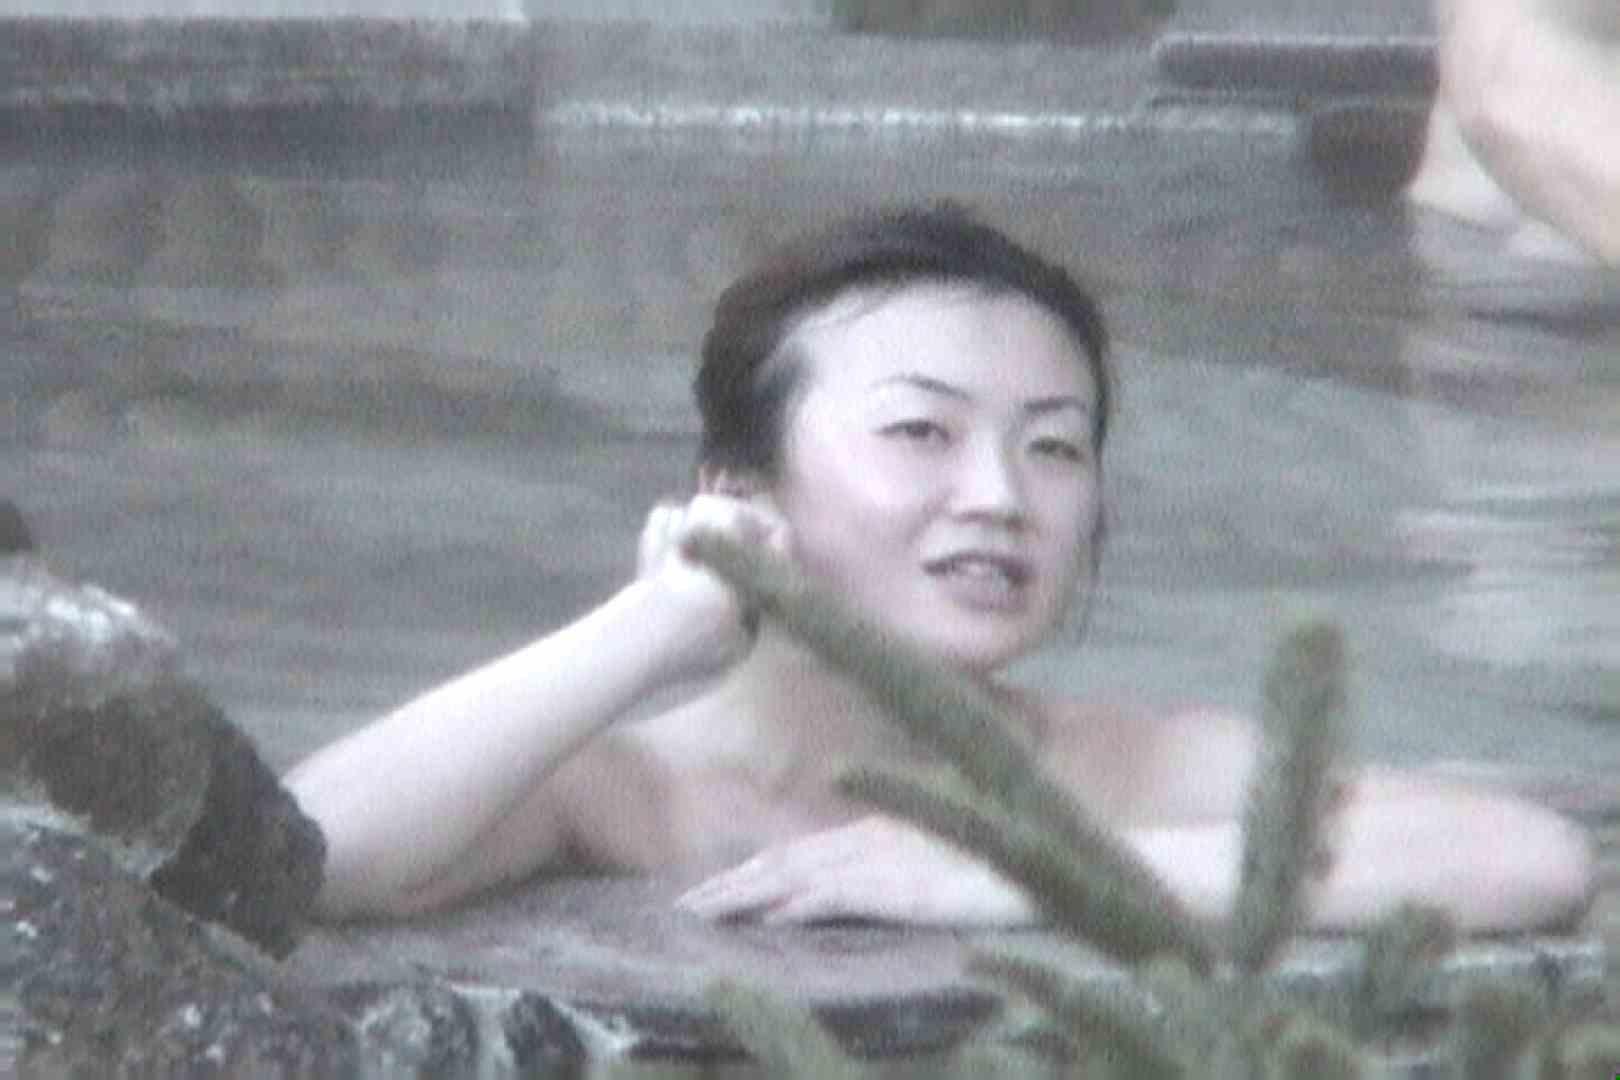 Aquaな露天風呂Vol.561 露天 のぞき動画キャプチャ 80pic 29